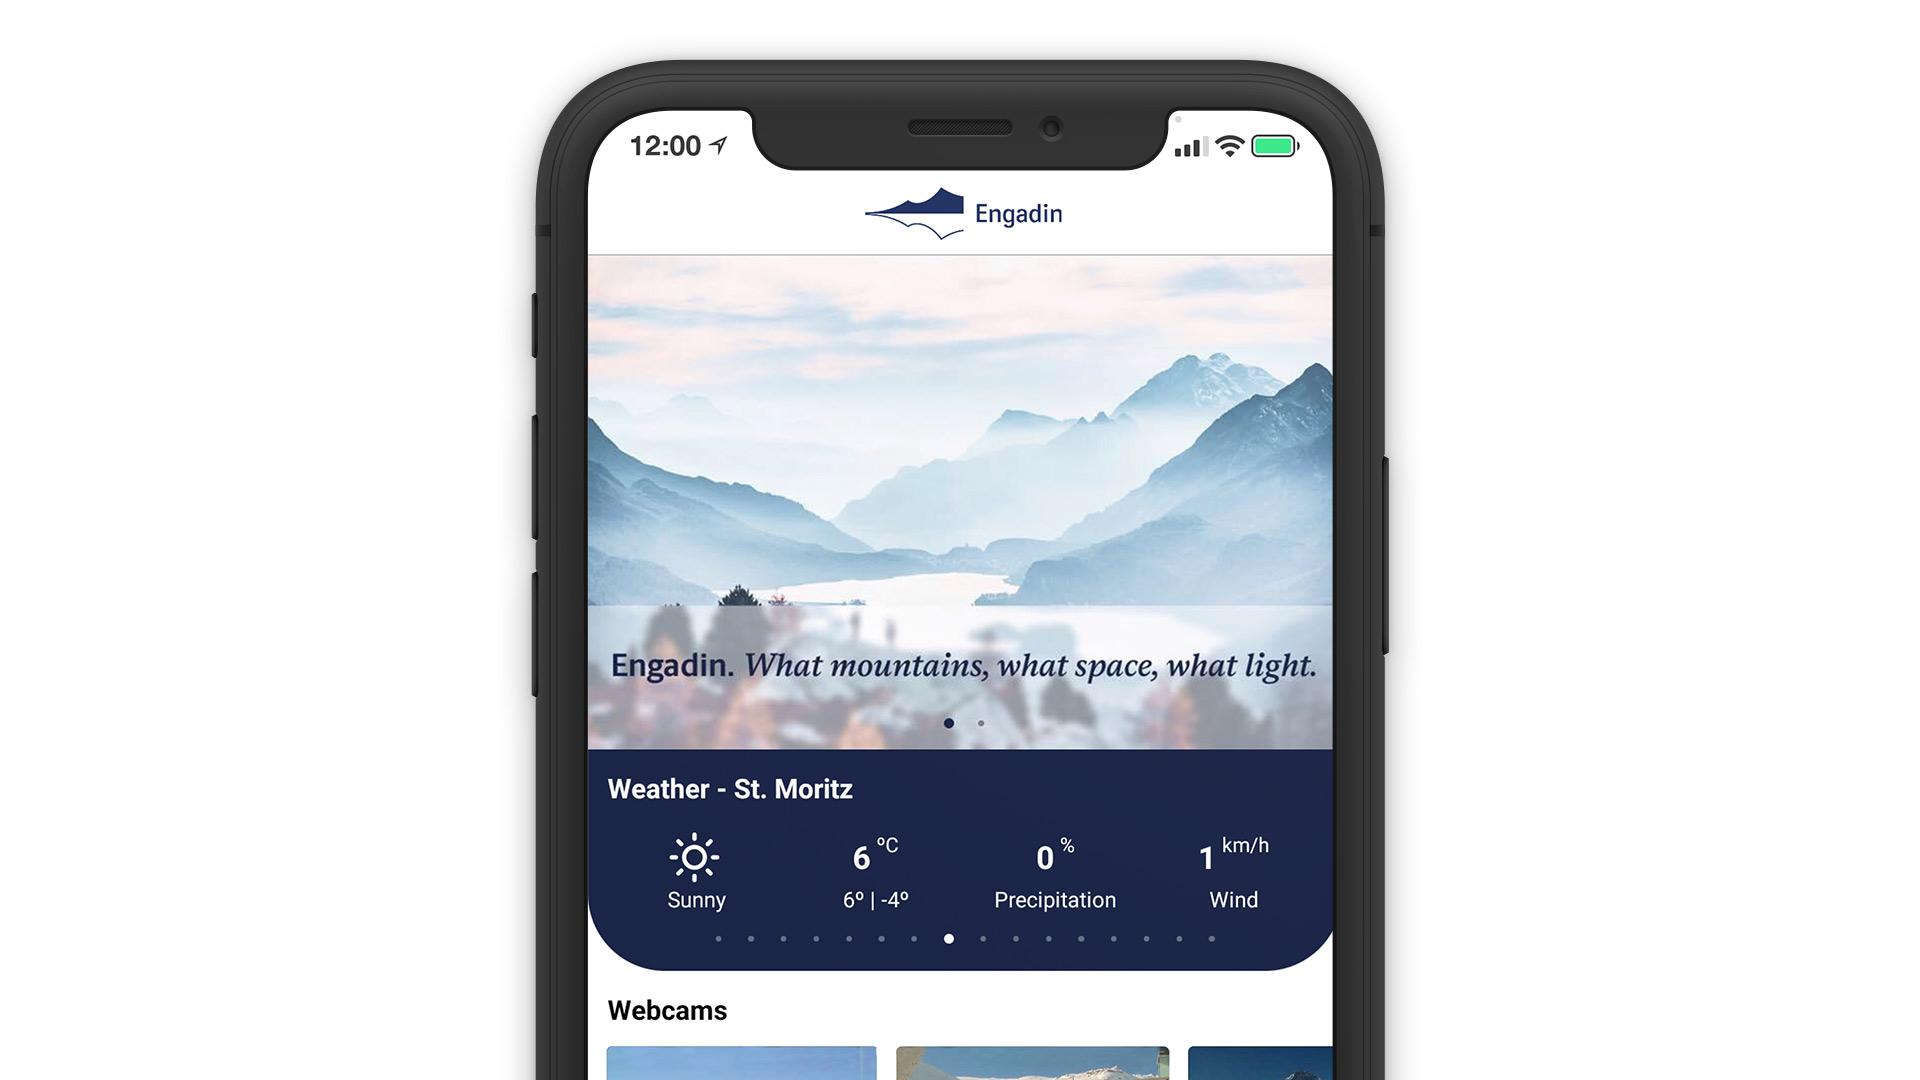 Engadin Mobile App Online Direct Booking System Reservation Solution Smartphone Laptop